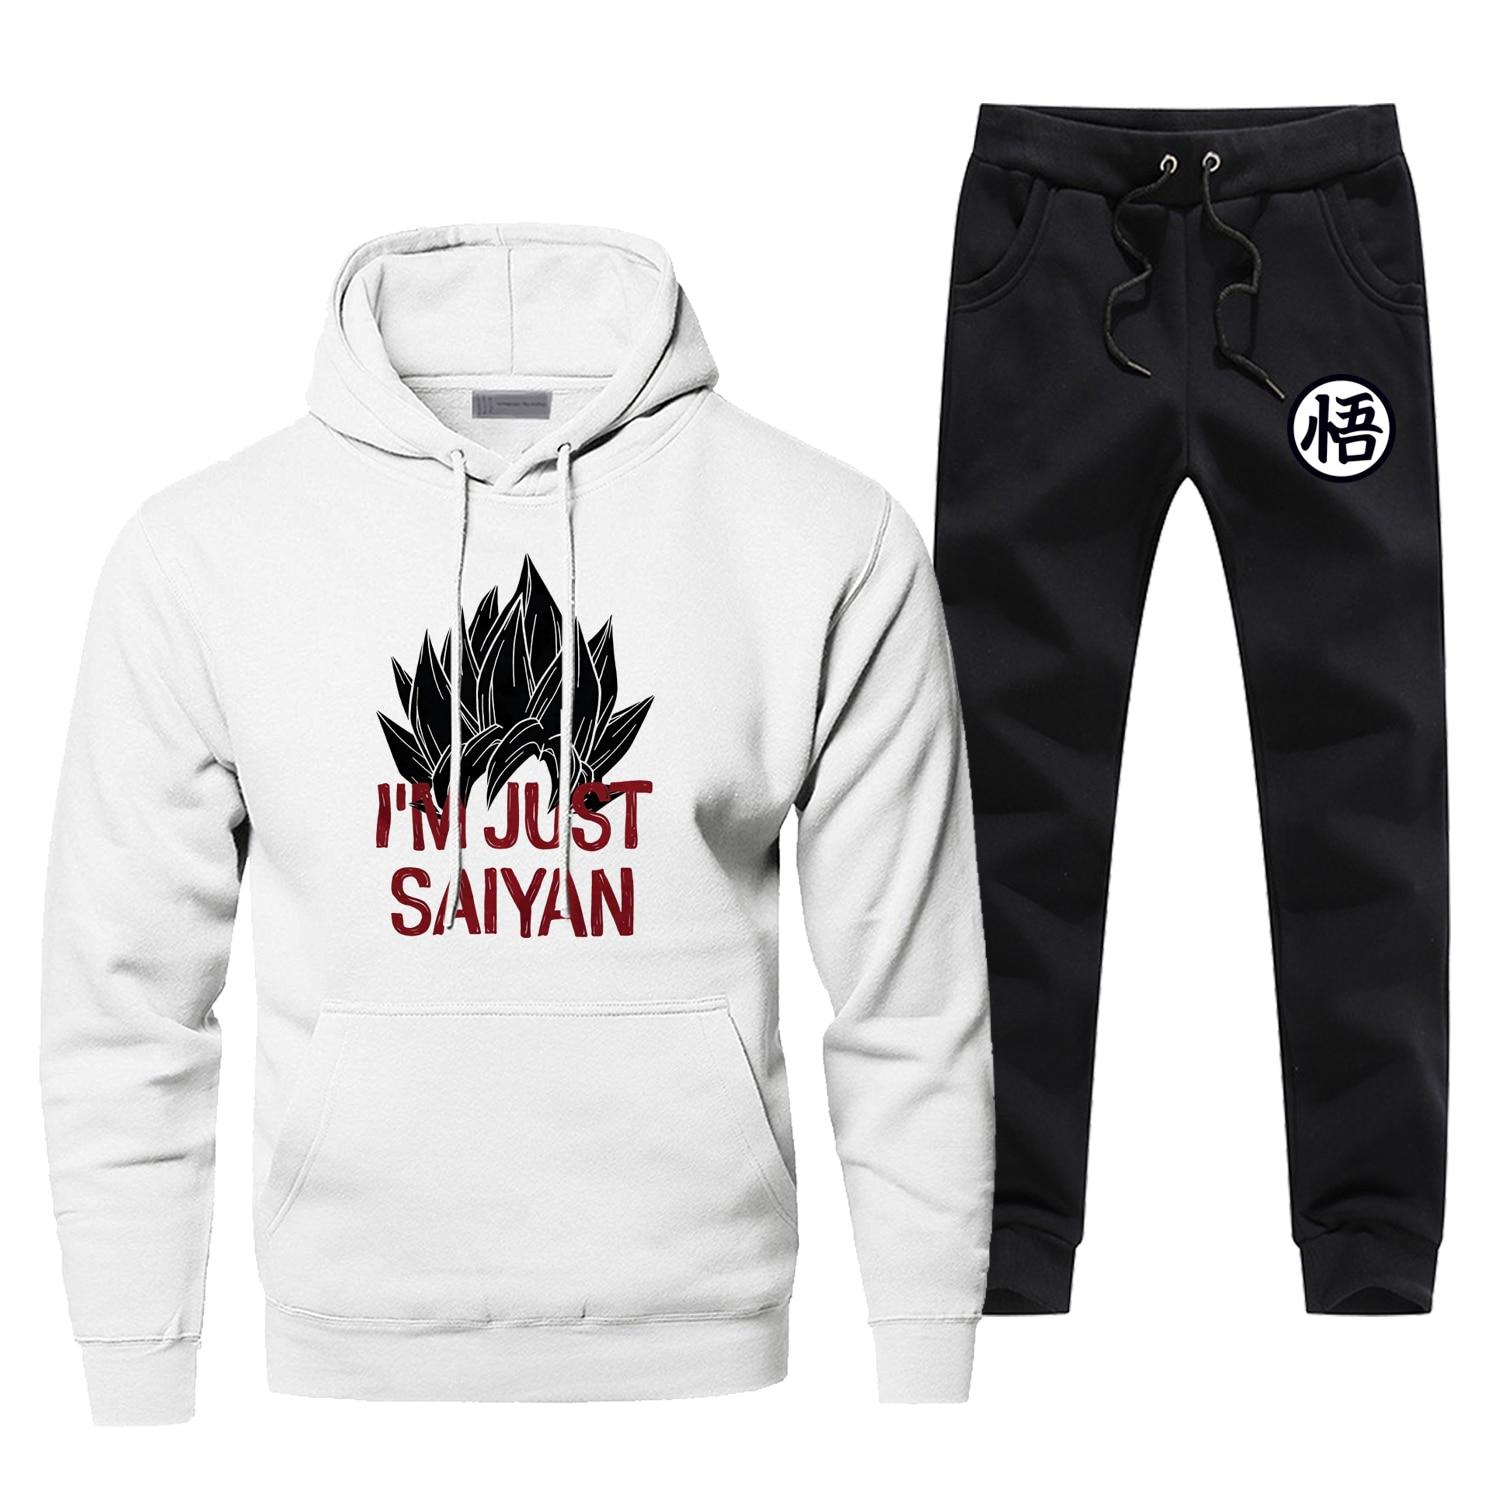 Dragon Ball Z Hoodies Pants Set Men I'm Just Saiyan Super Suit Sweatshirt Sweatpants Sportswear Autumn Pullover 2 PCS Tracksuit